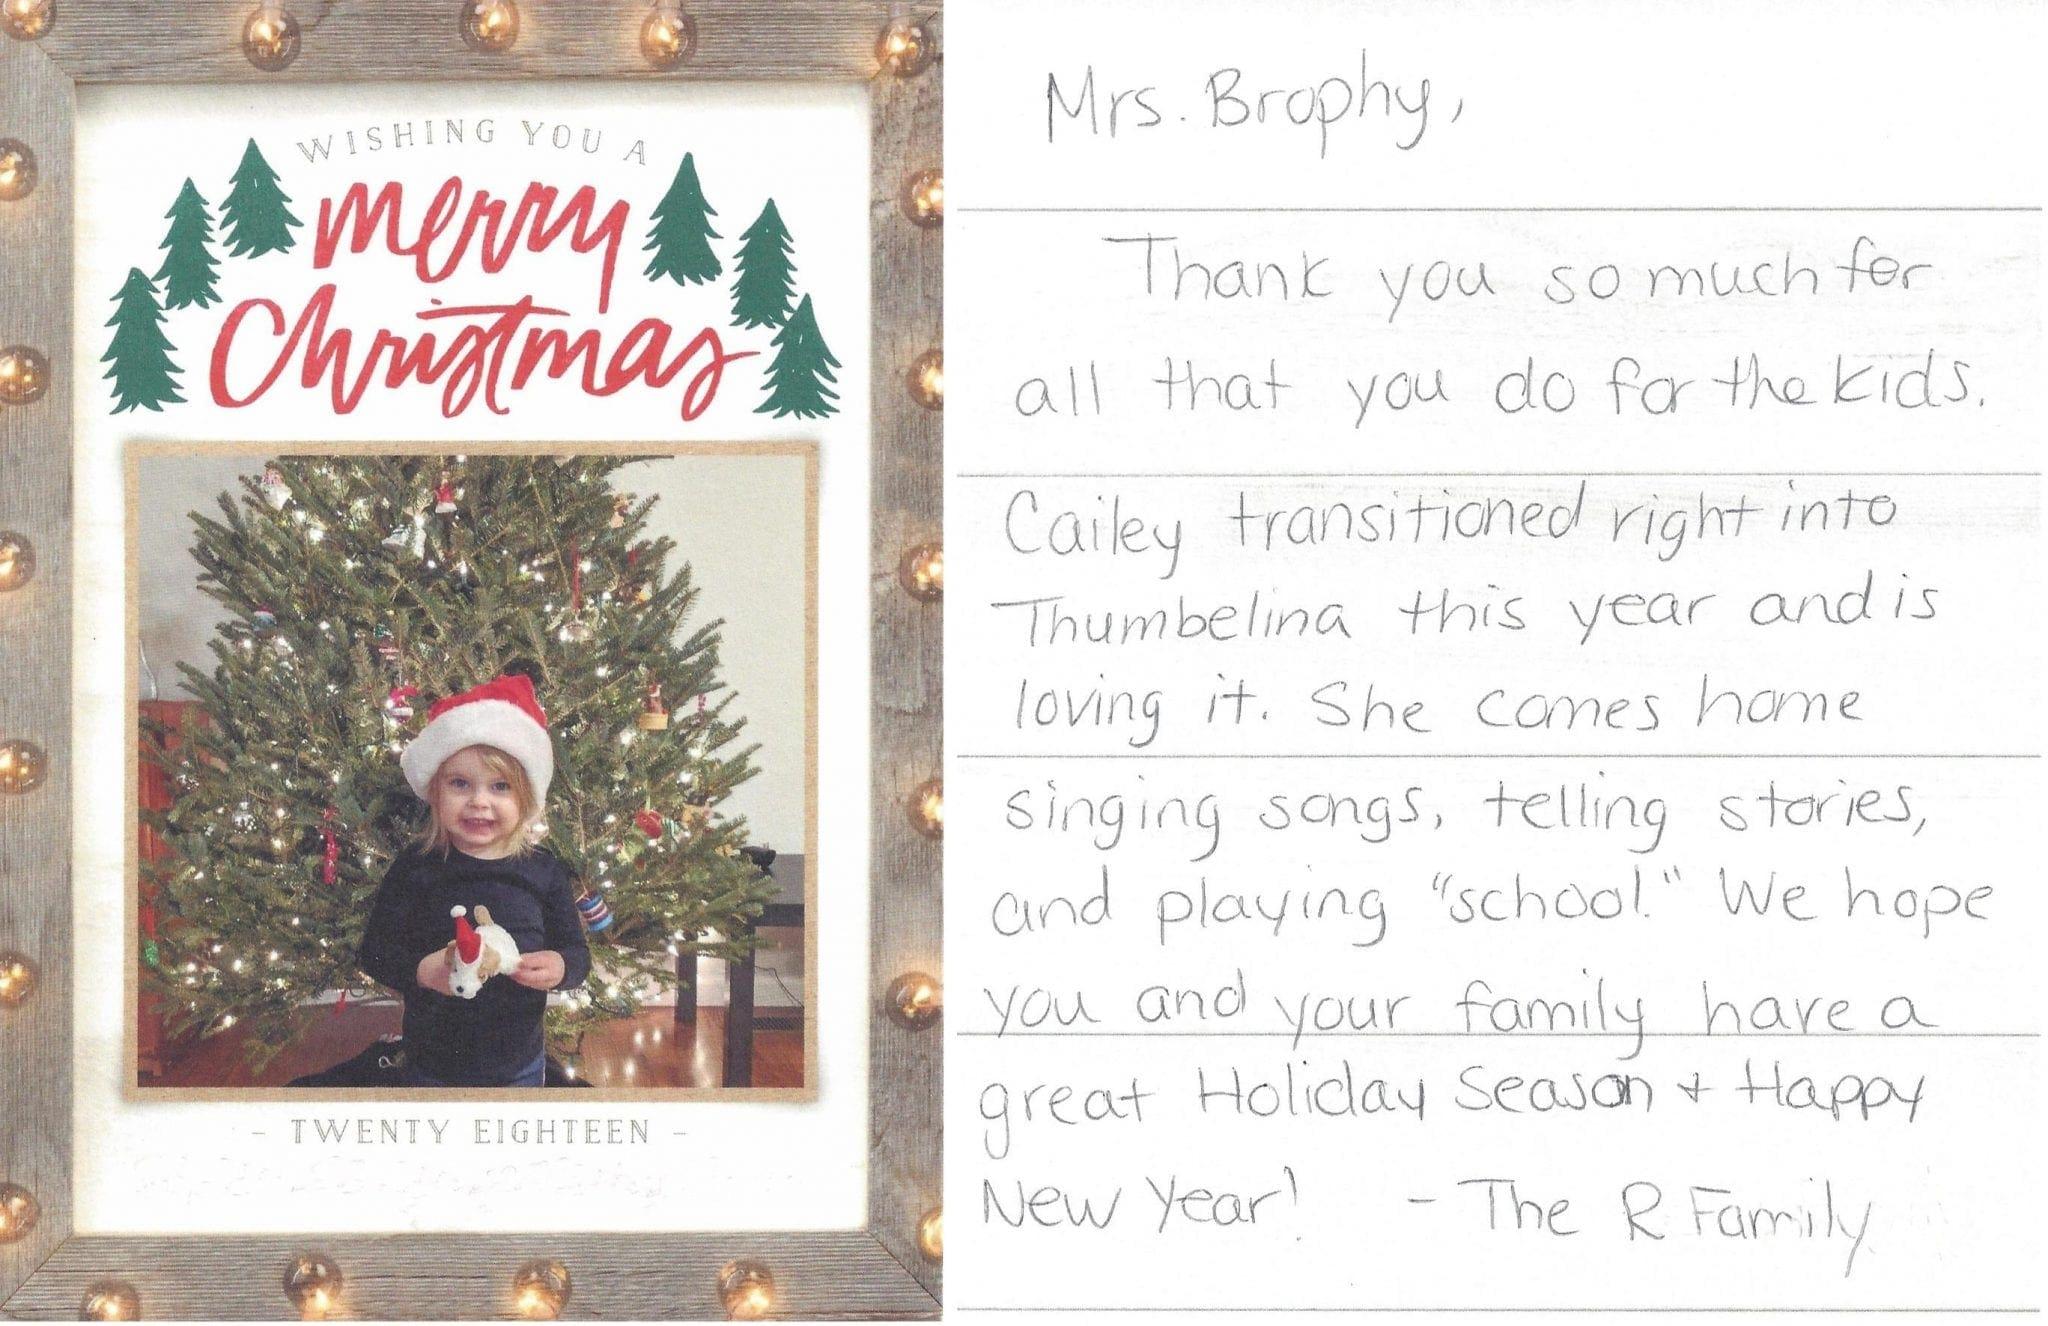 ThumBelina 2's Program Thank You from the R Family